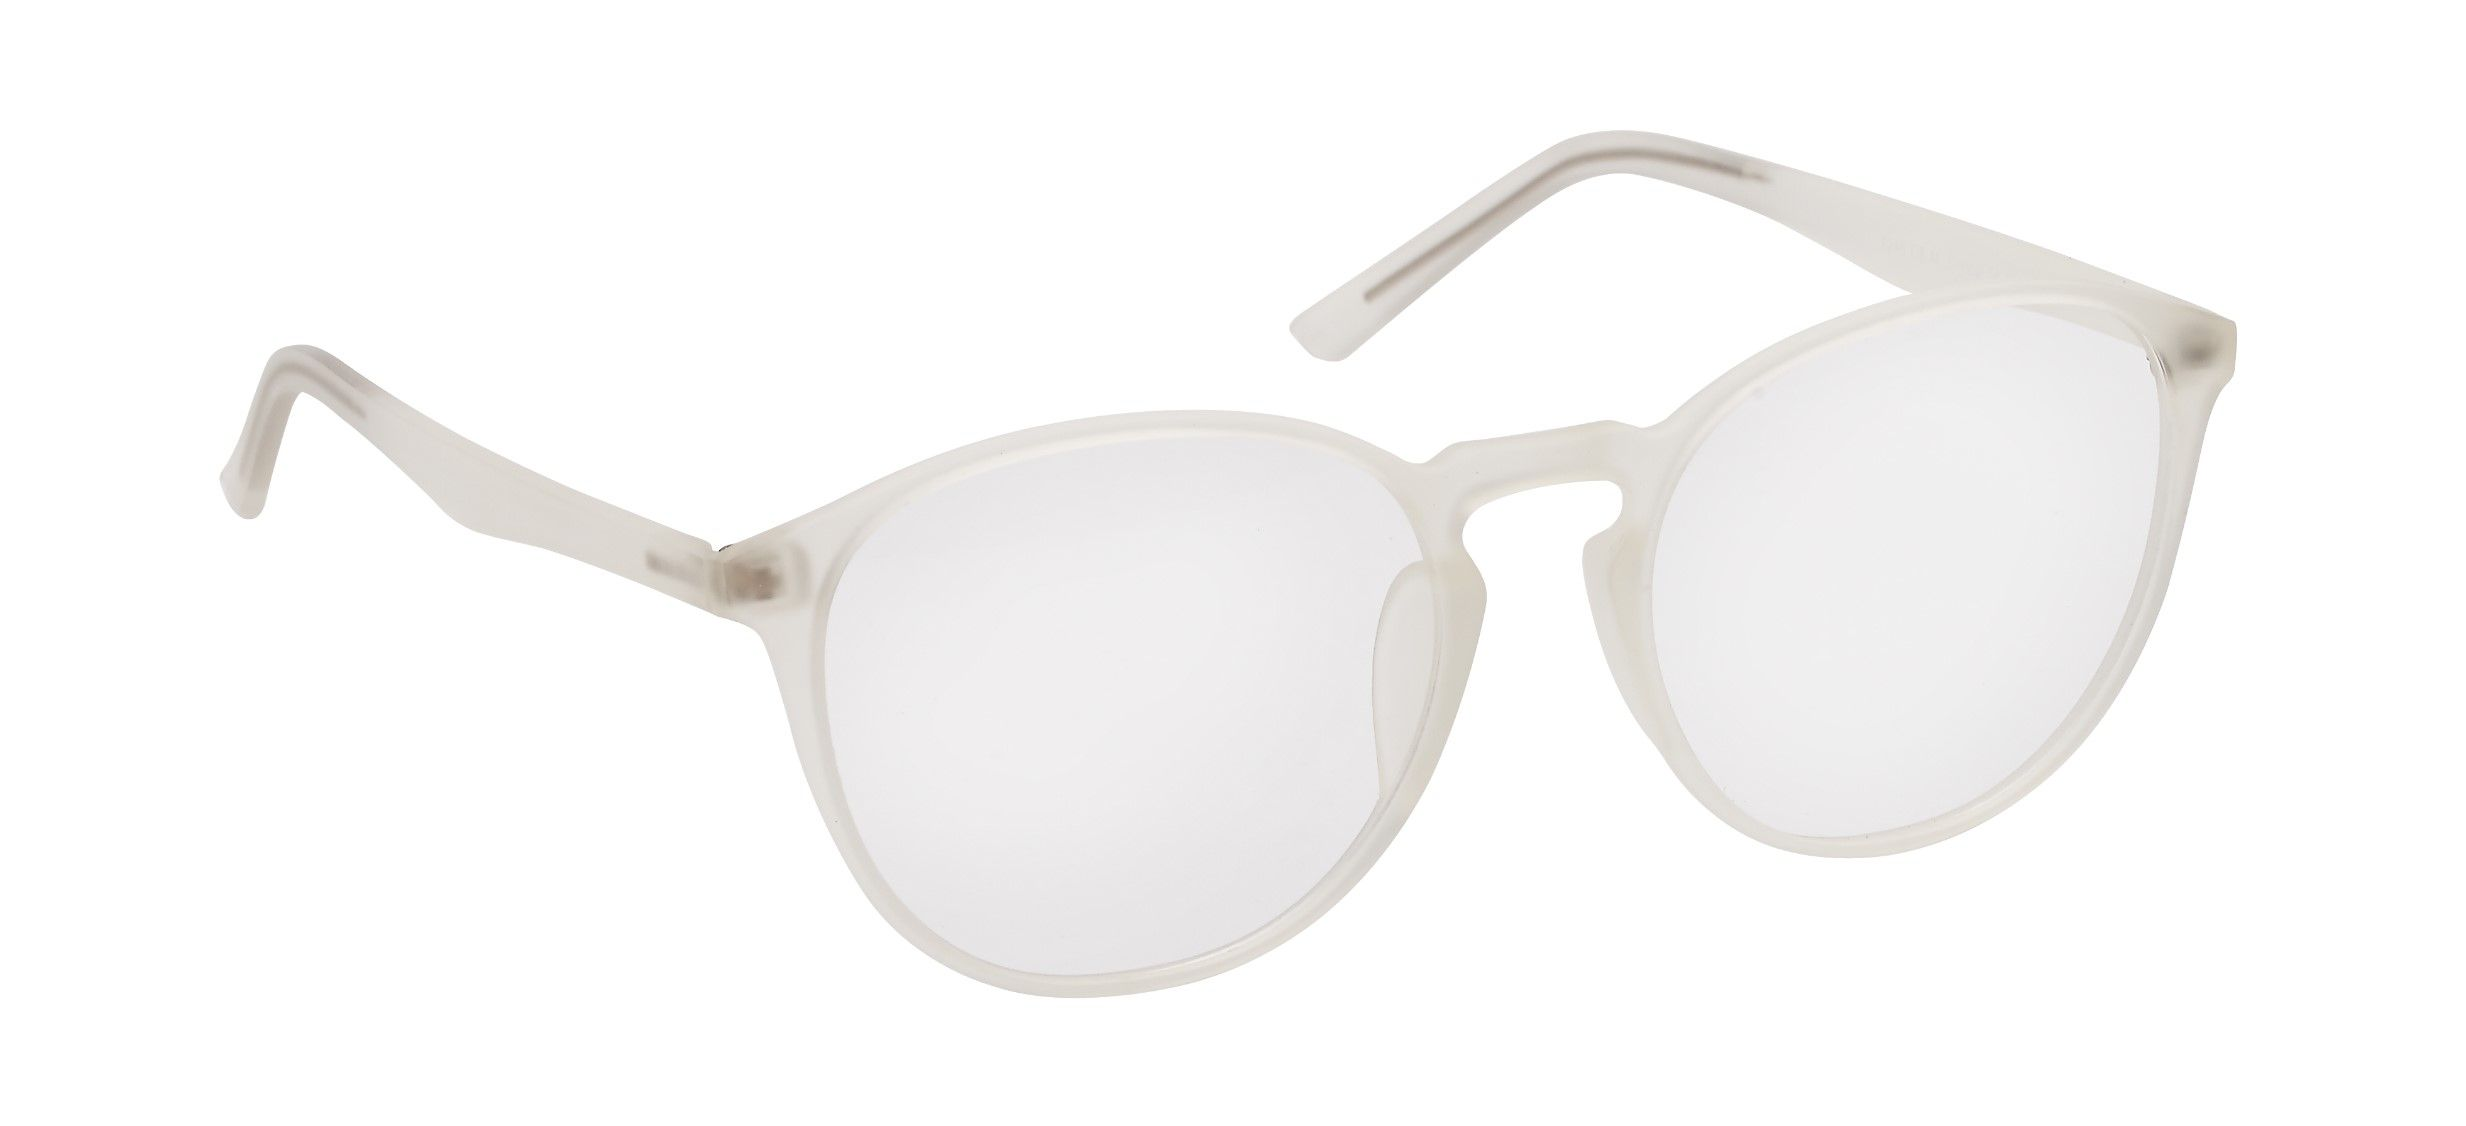 Color M. Crystal MX 2246-8 #BKFrames #Maximaeyewear #colorful #glasses #quality #trend #fashion #matte #modern